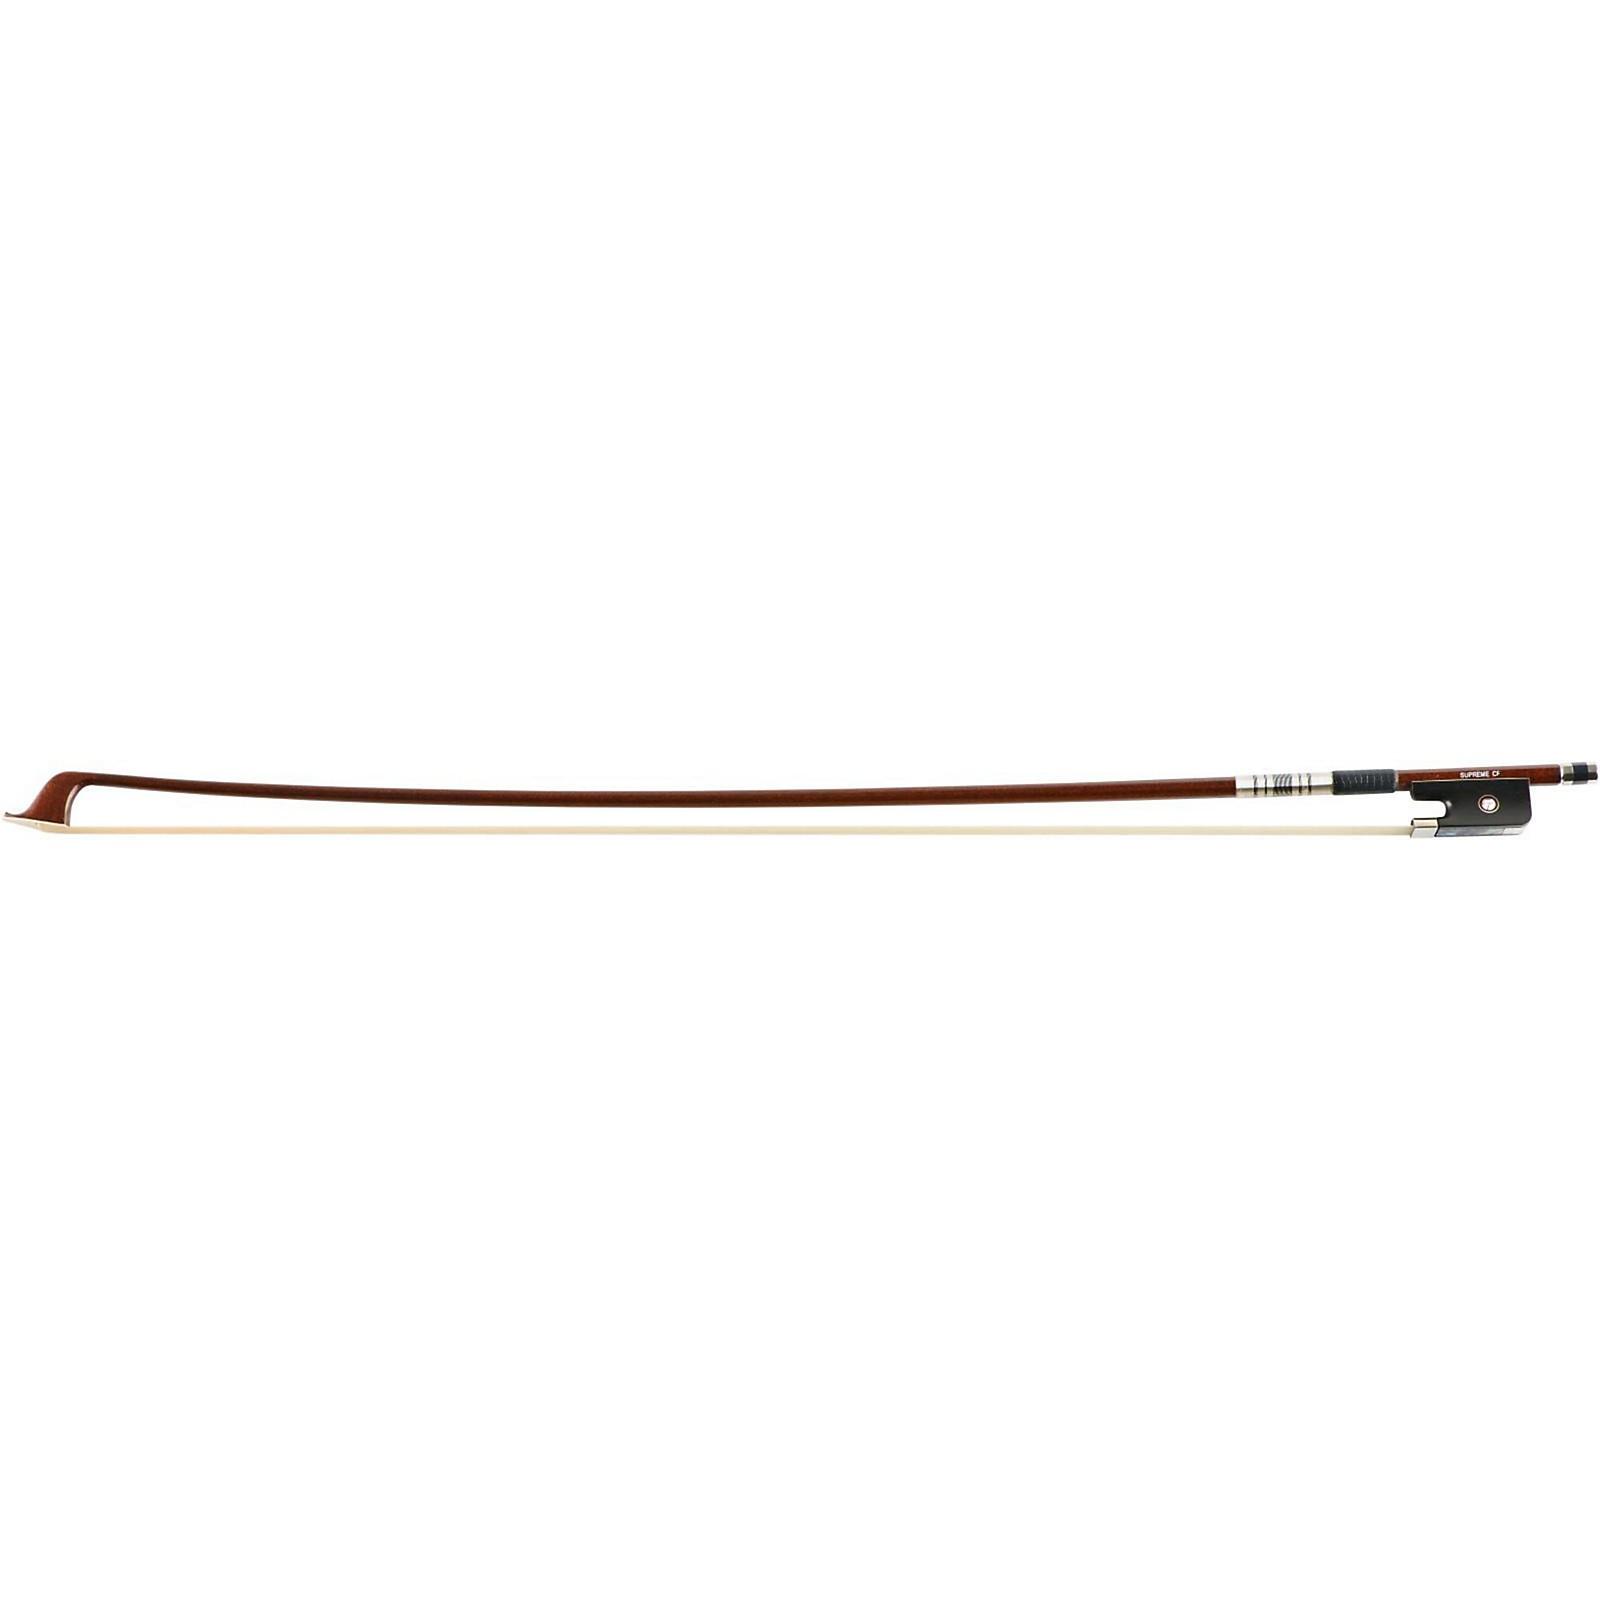 Arcolla Supreme Carbon Fiber Cello Bow